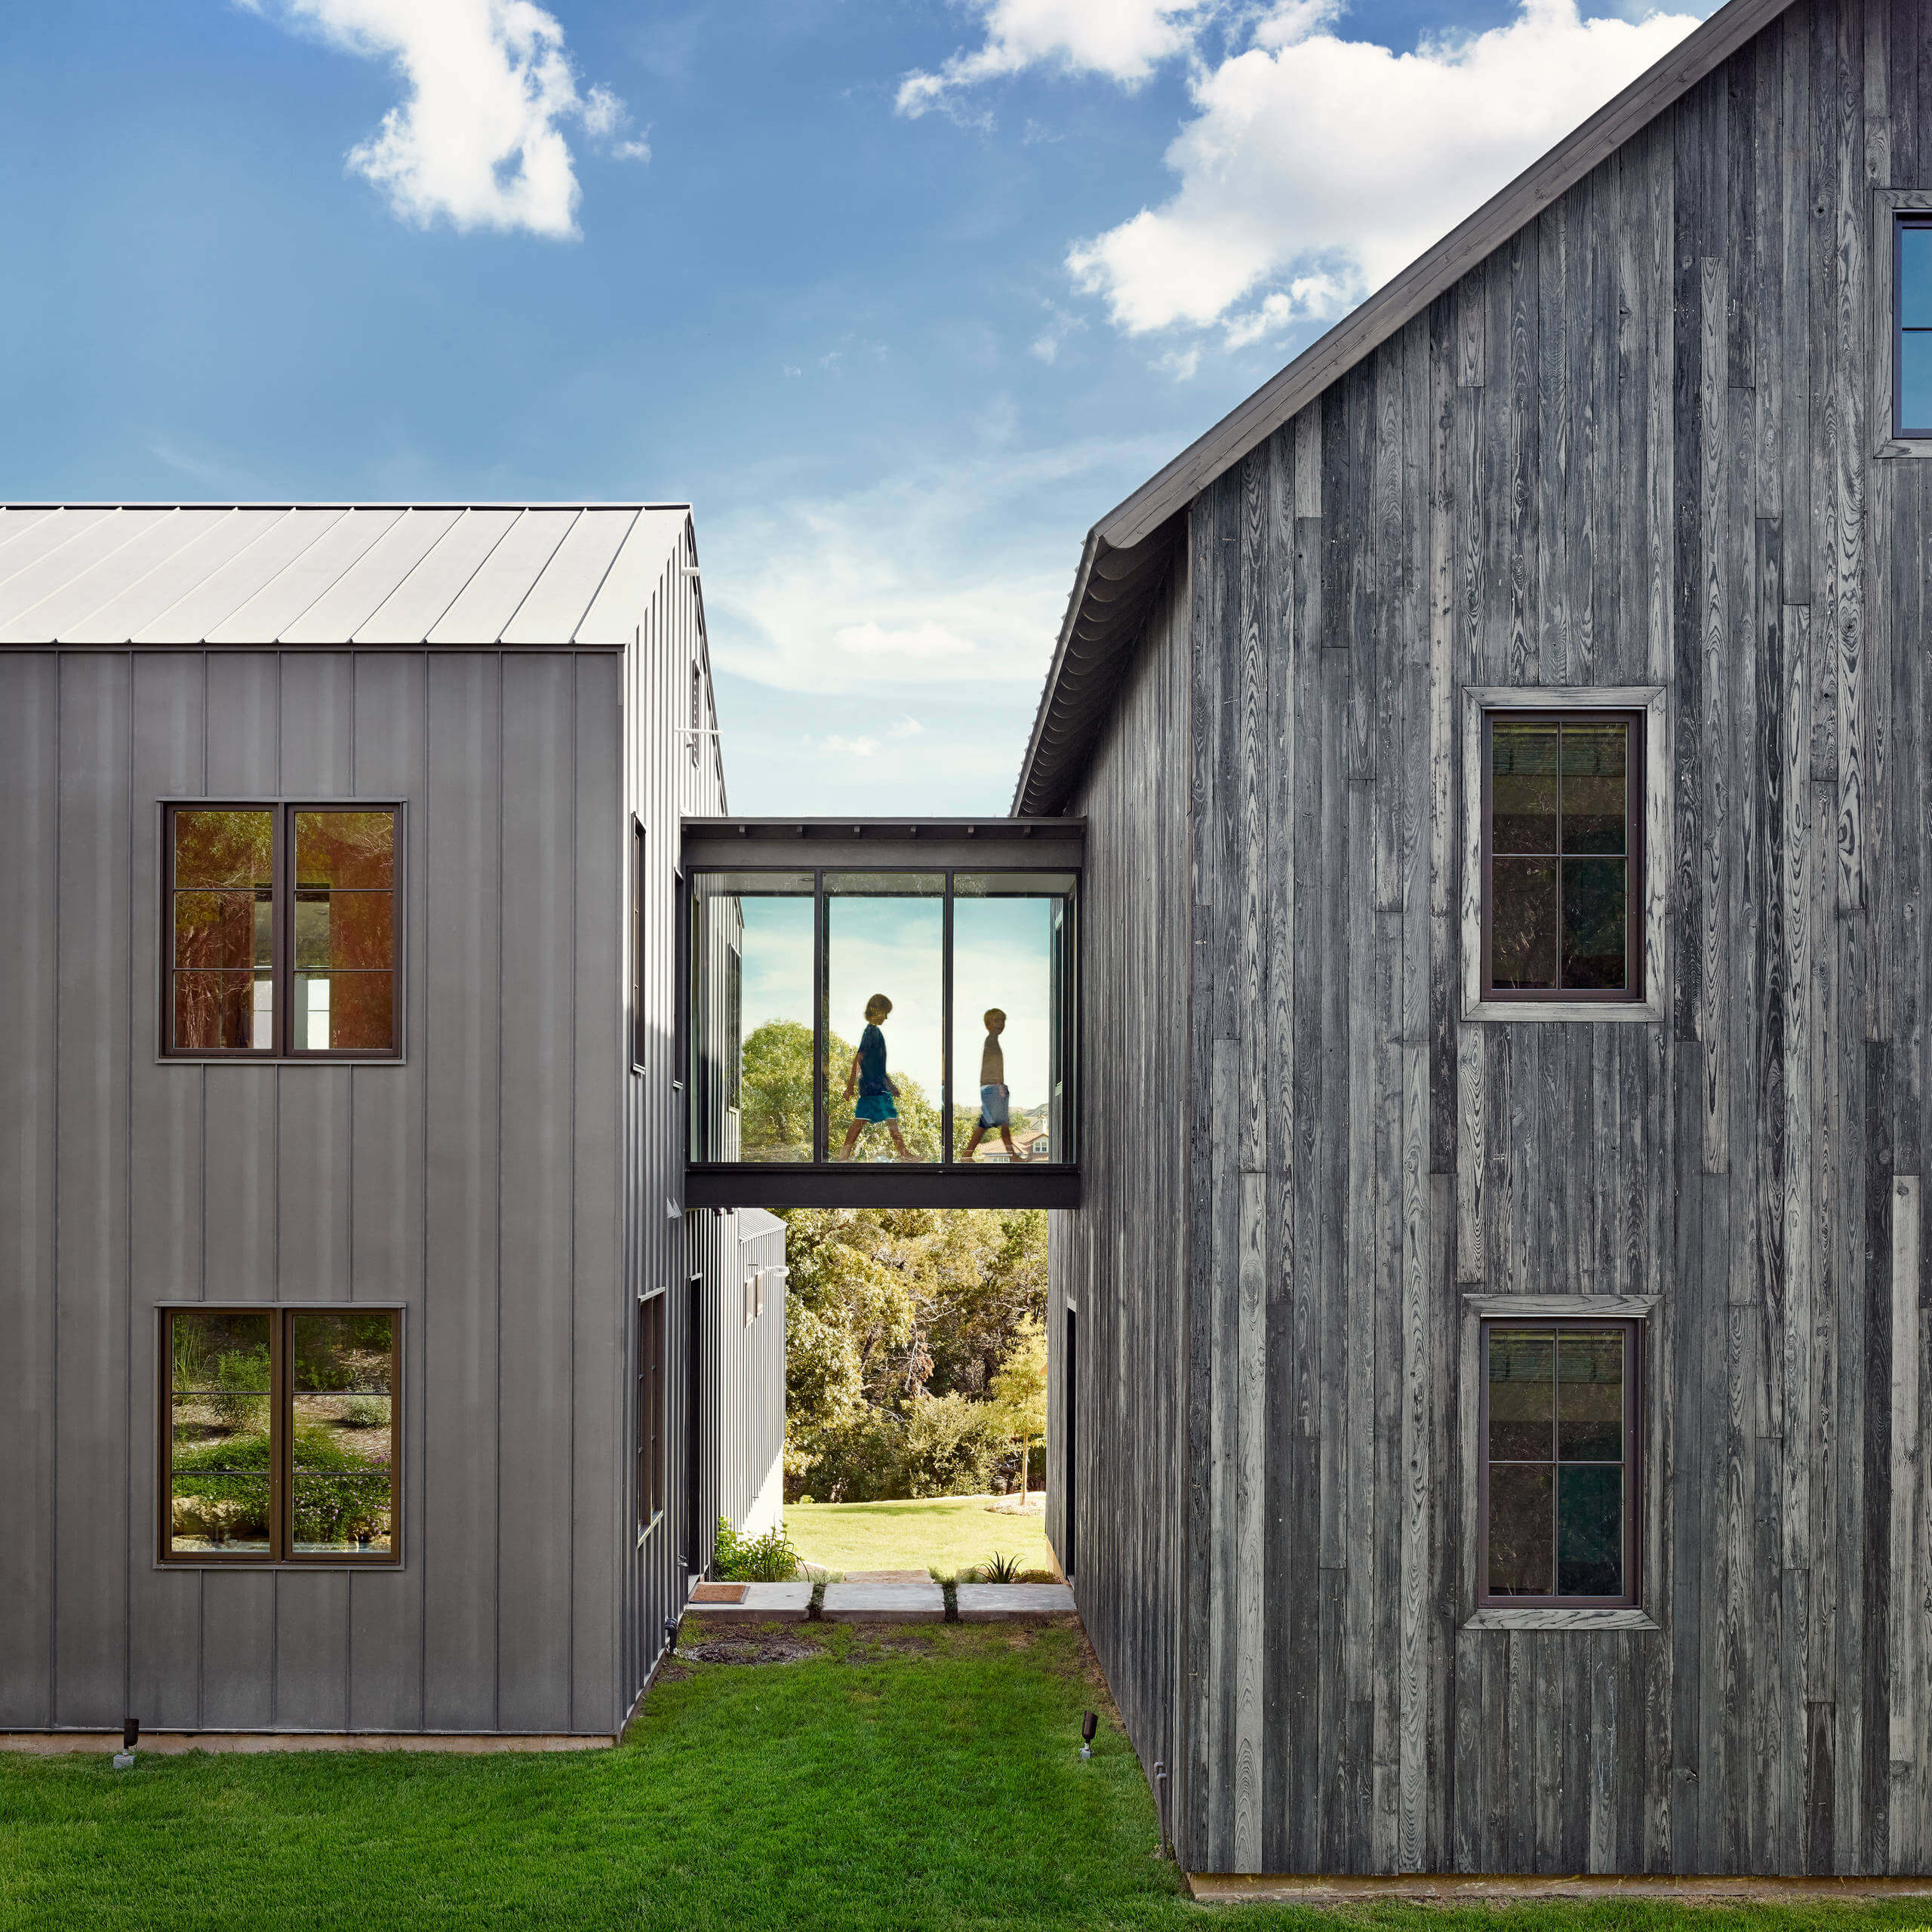 farmhouse-shiflet-group-architects-02